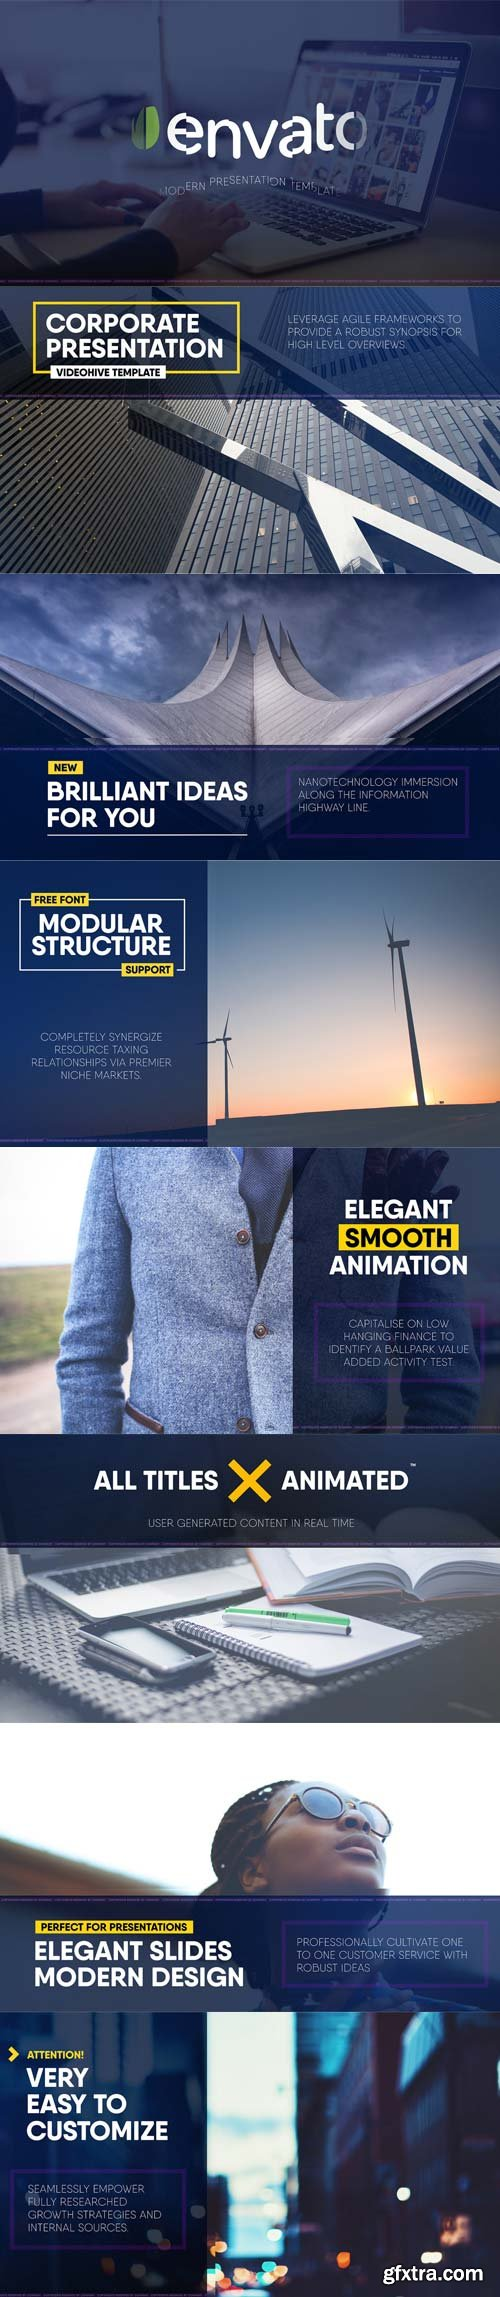 Videohive - Elegant Corporate Slides - 18747979